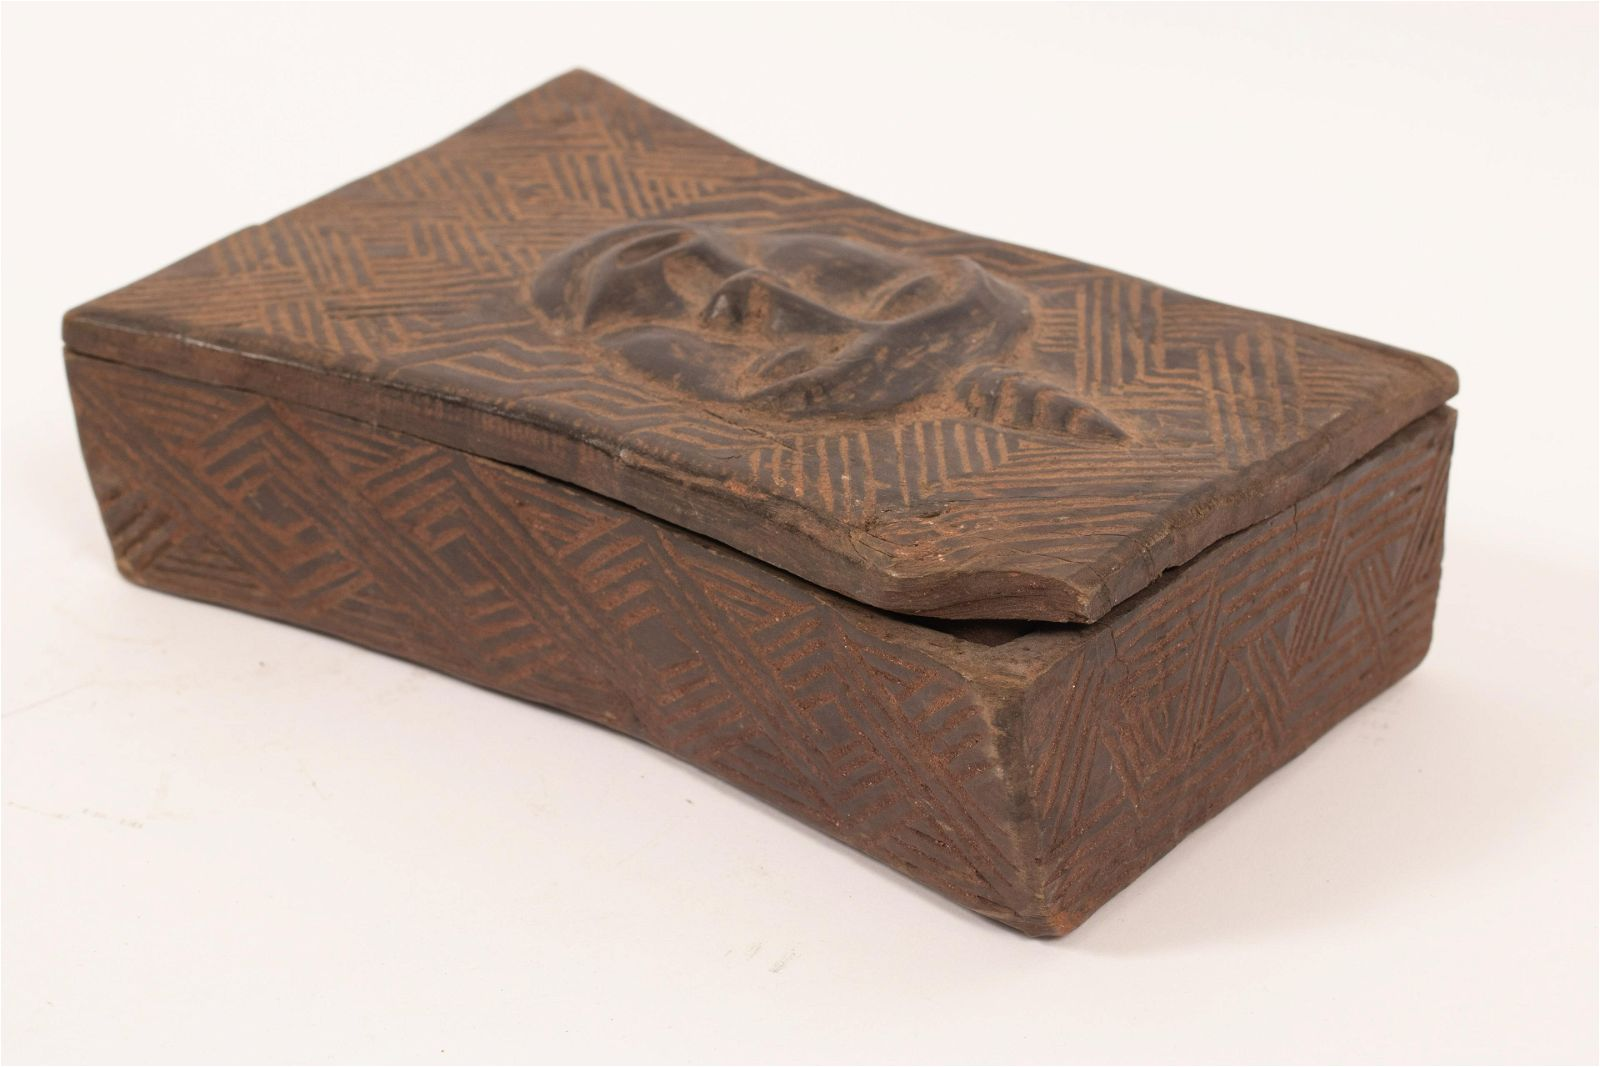 AFRICAN ZULU CARVED WOOD TOBACCO BOX, LOOSE LID, 1830